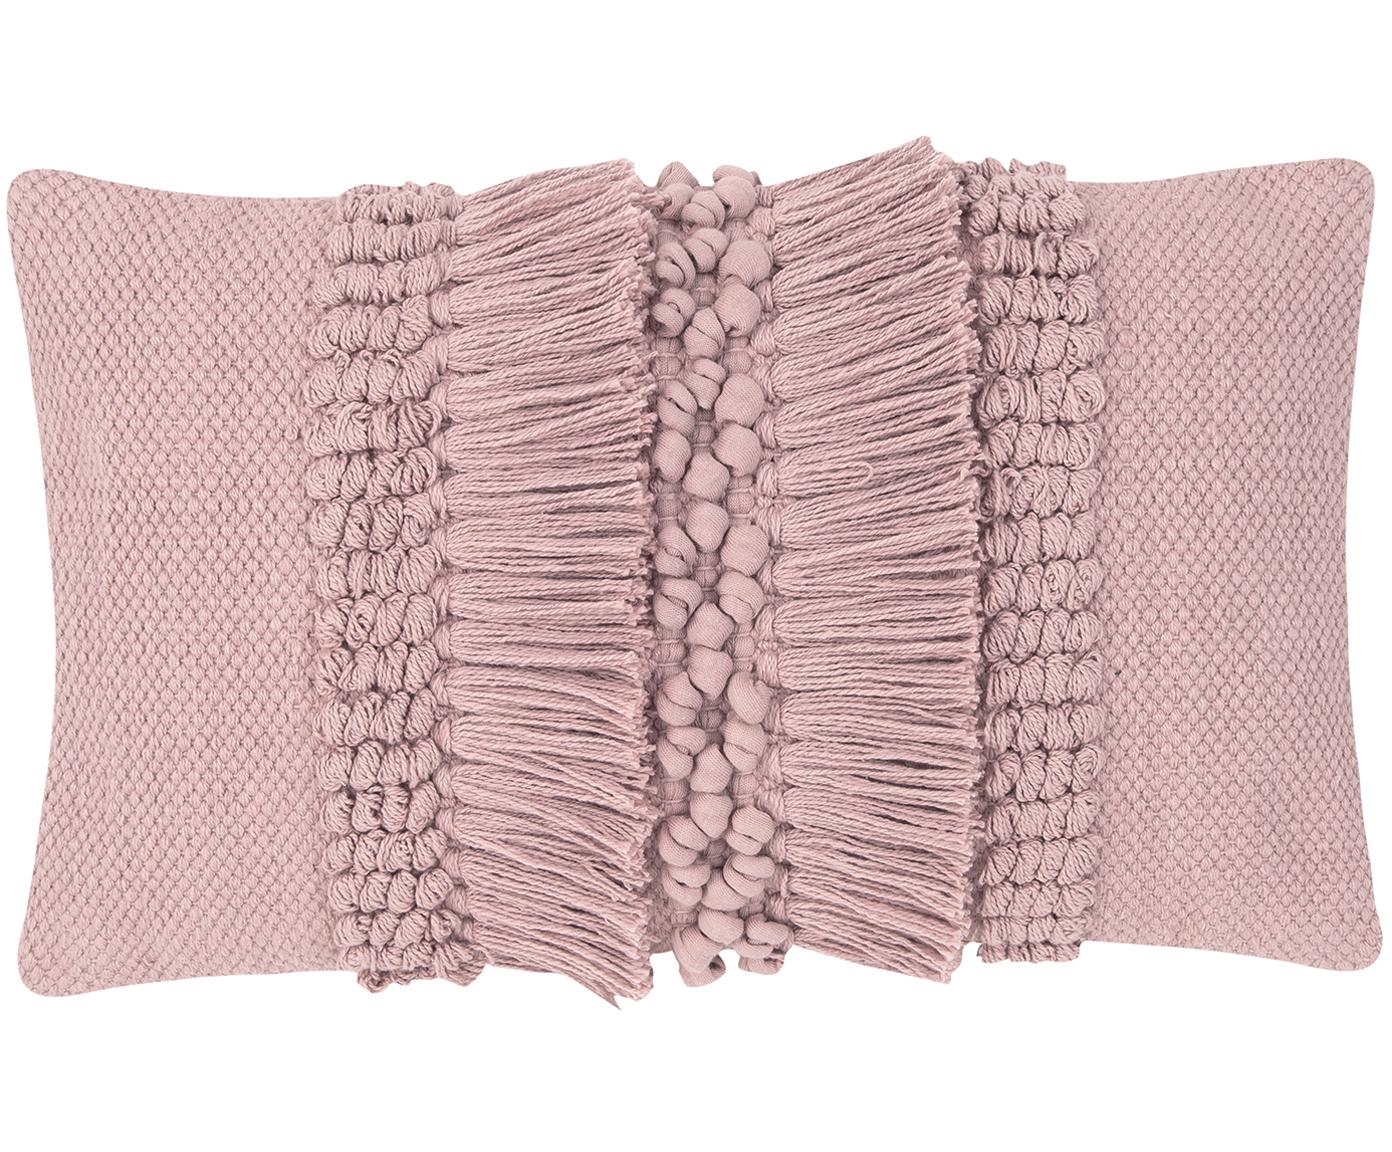 Kissenhülle Monika, 100% Baumwolle, Altrosa, 30 x 50 cm